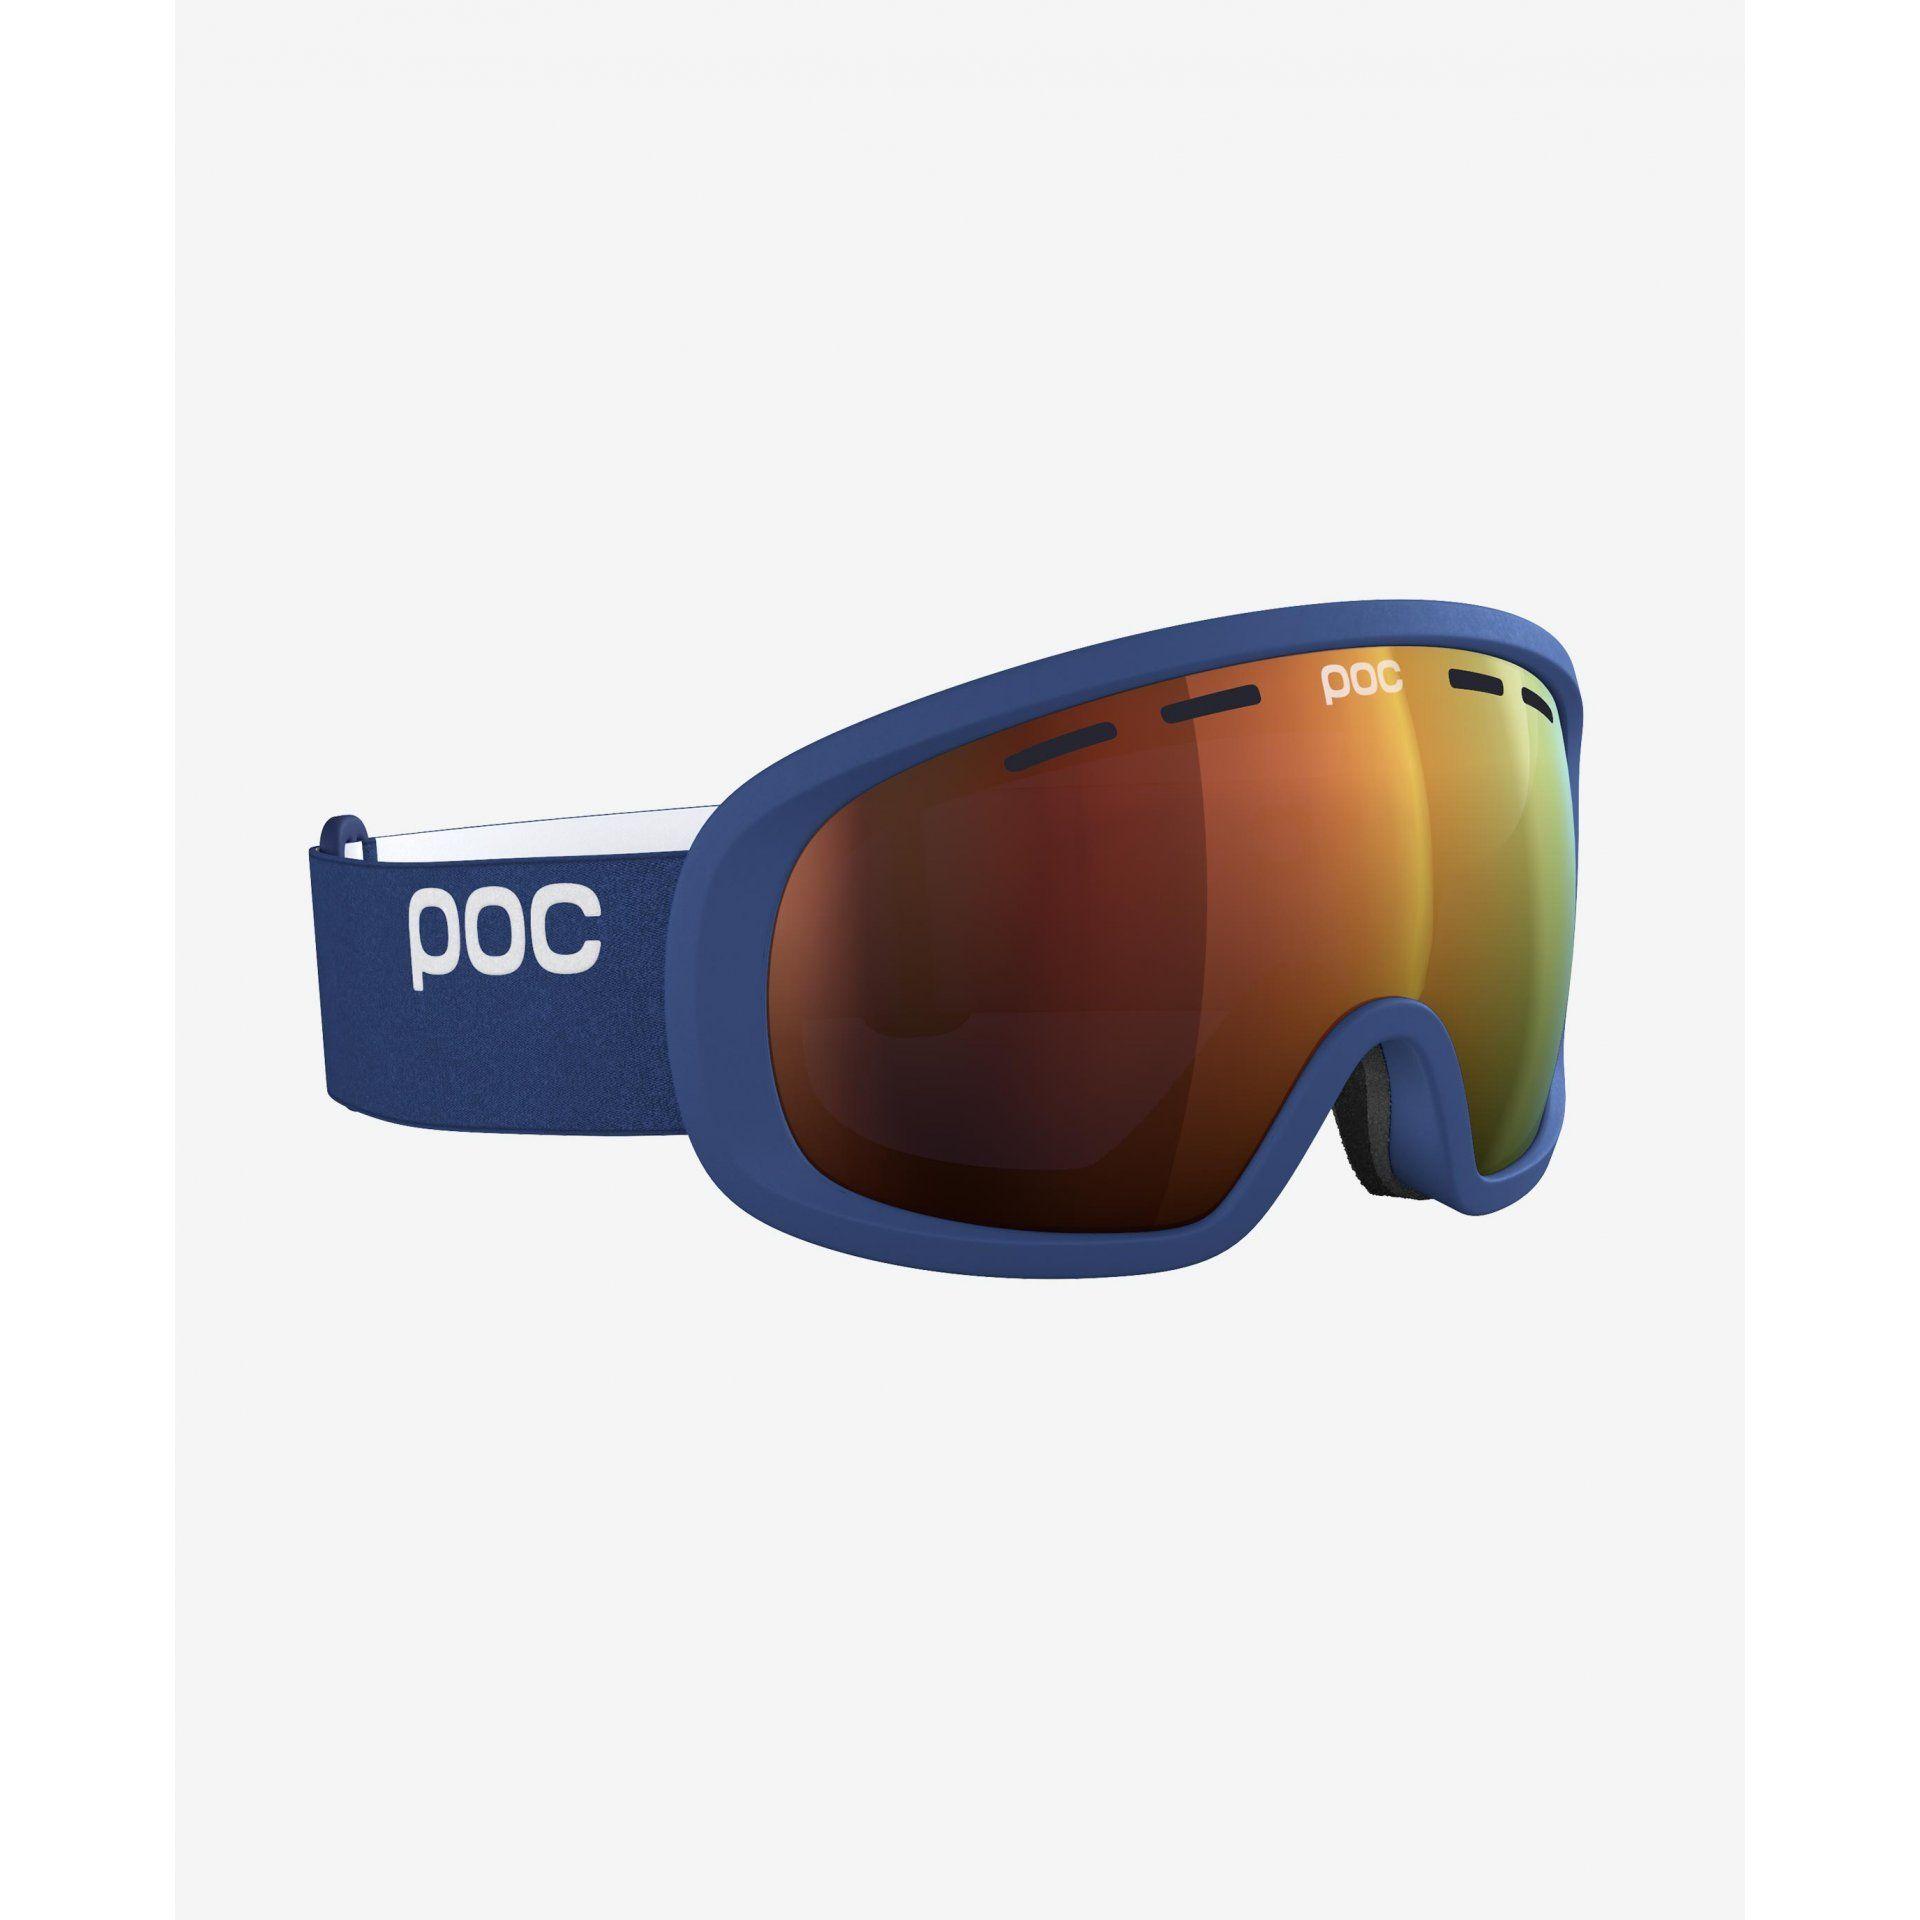 GOGLE POC FOVEA MID CLARITY LEAD BLUE SPEKTRIS ORANGE 40408-8270 4